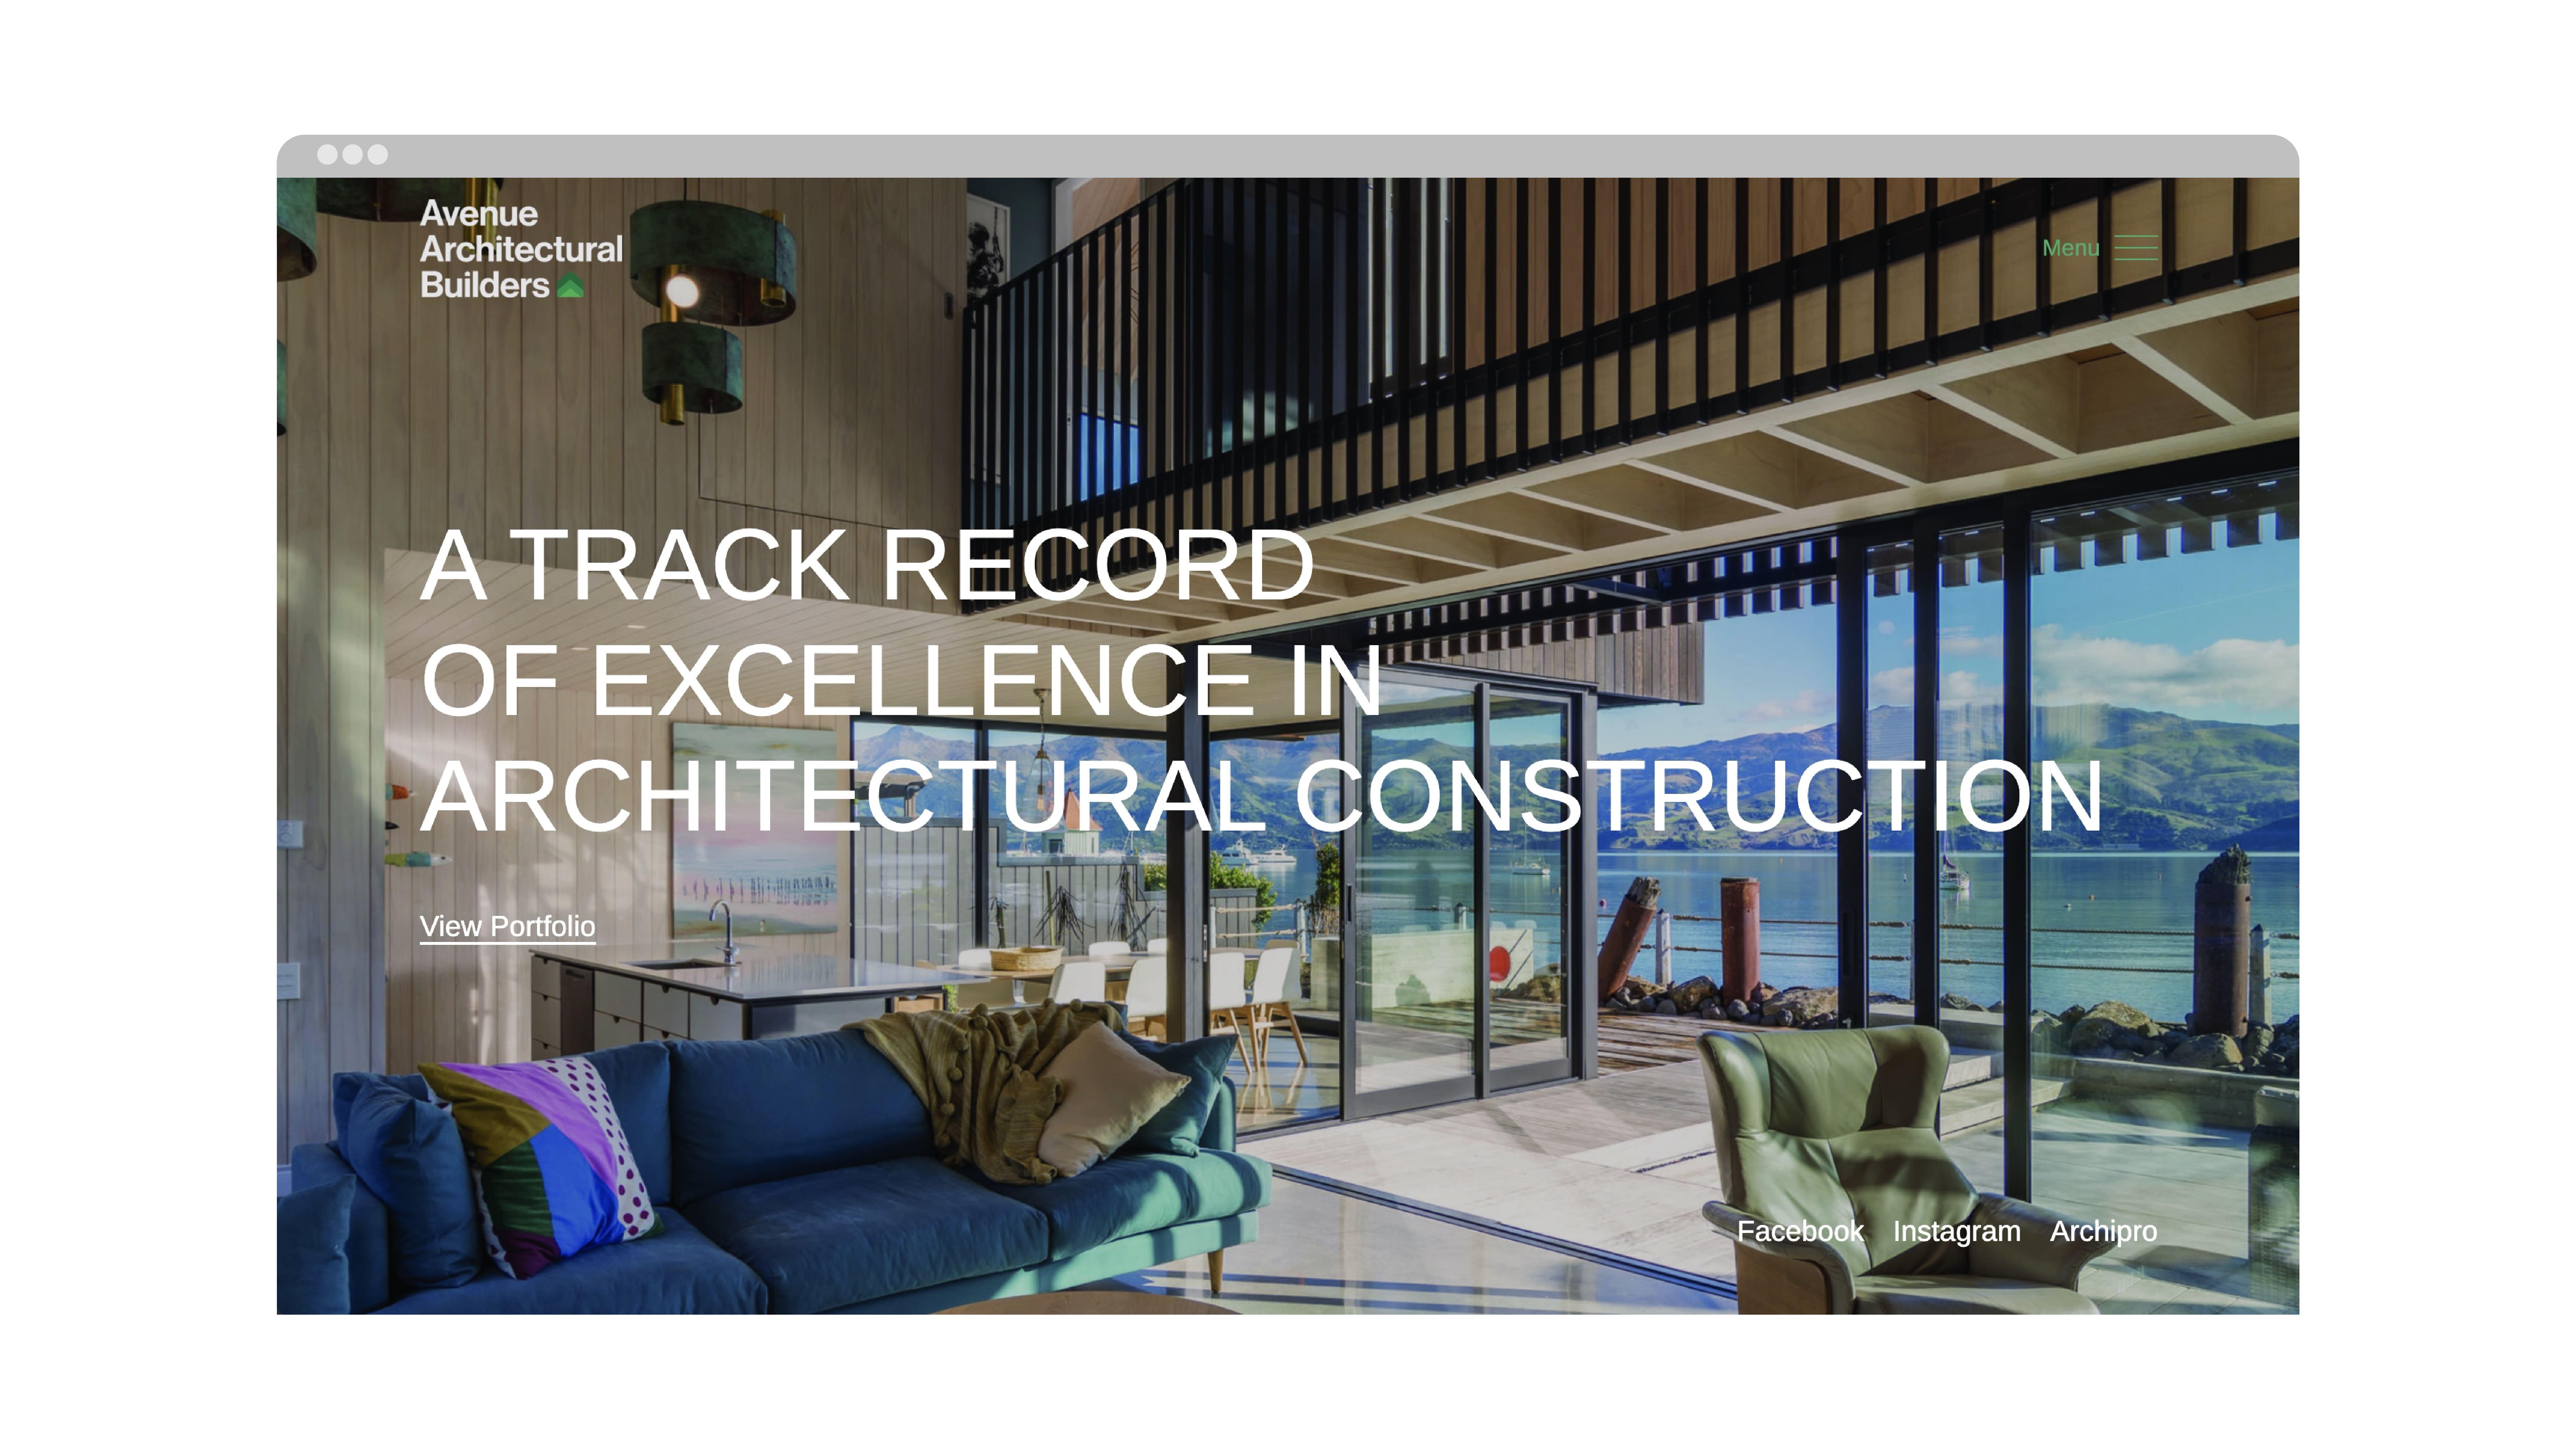 attraction studio avenue architectural brand web website landing